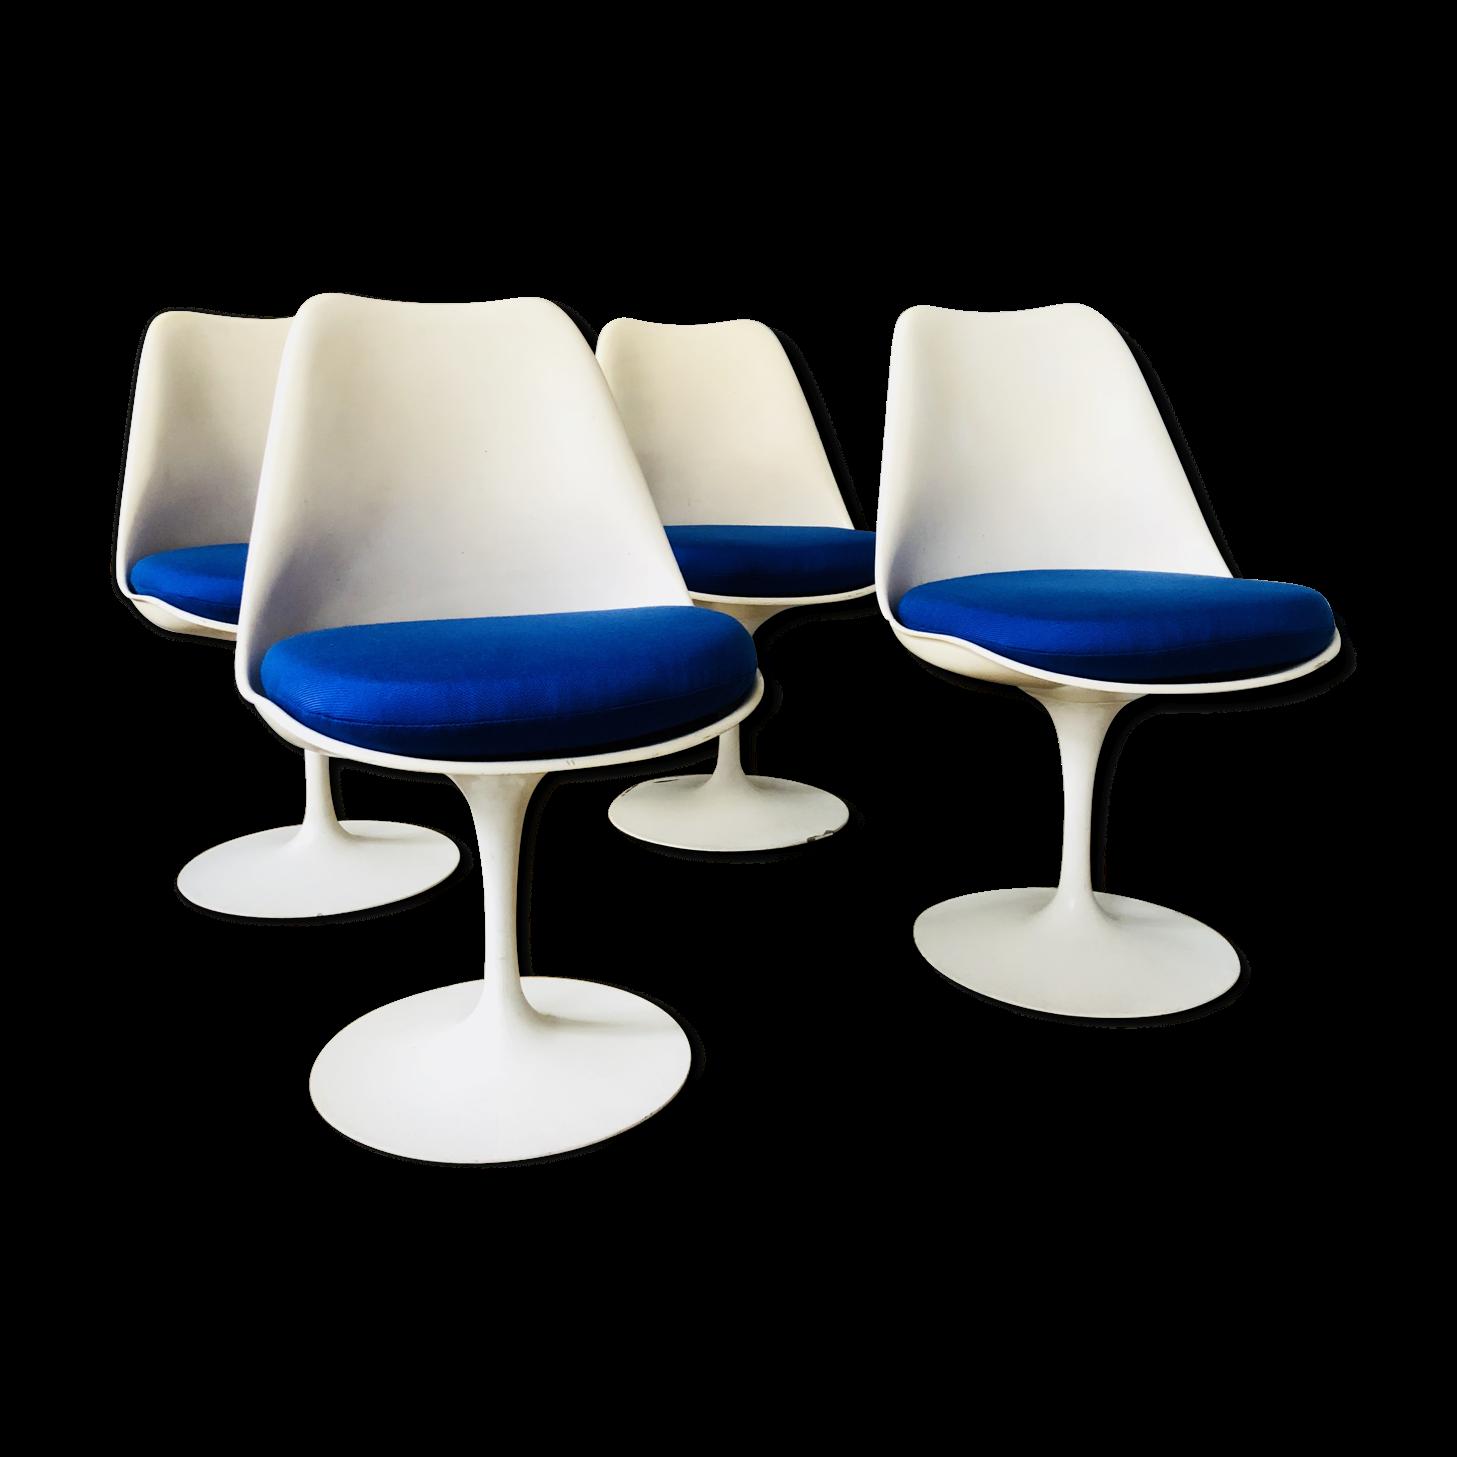 Chaises Tulipe Great Salon Design Signe Gautier Table Et Quatre